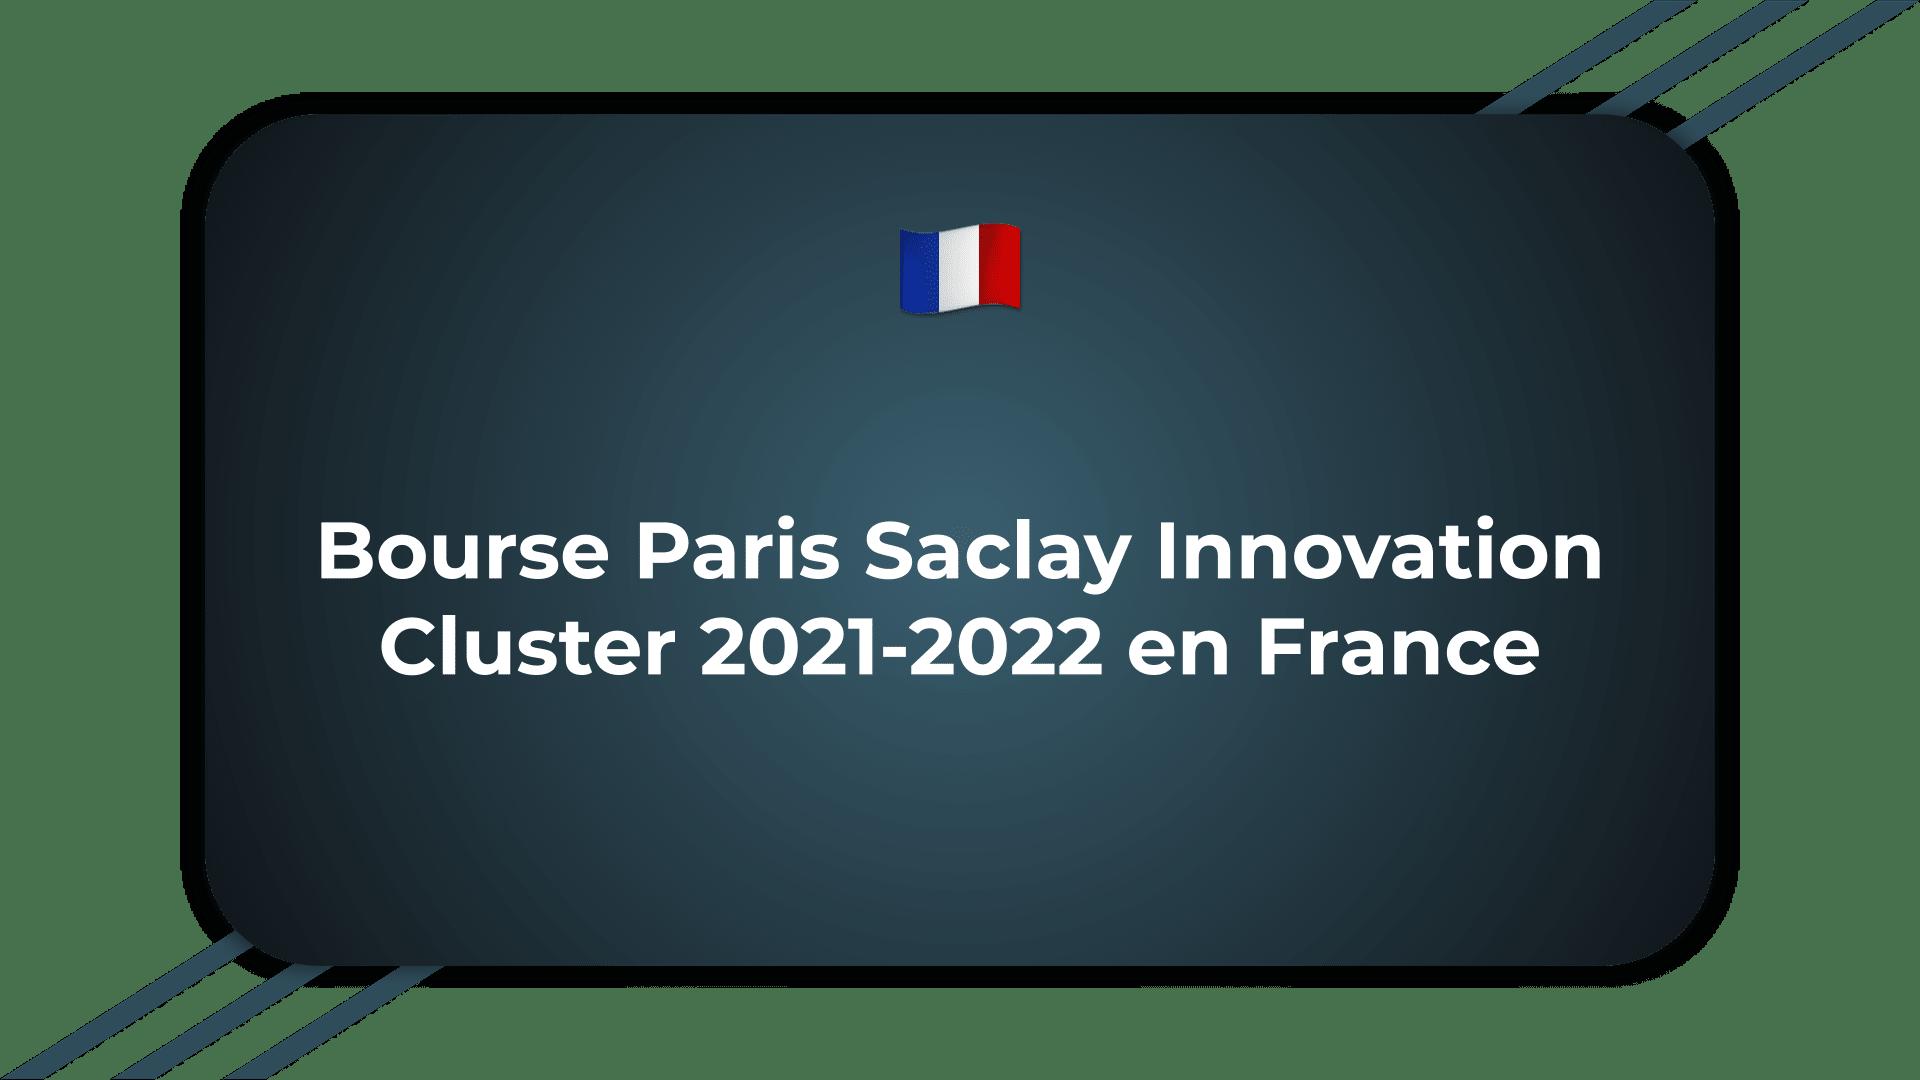 Bourse Paris Saclay Innovation Cluster